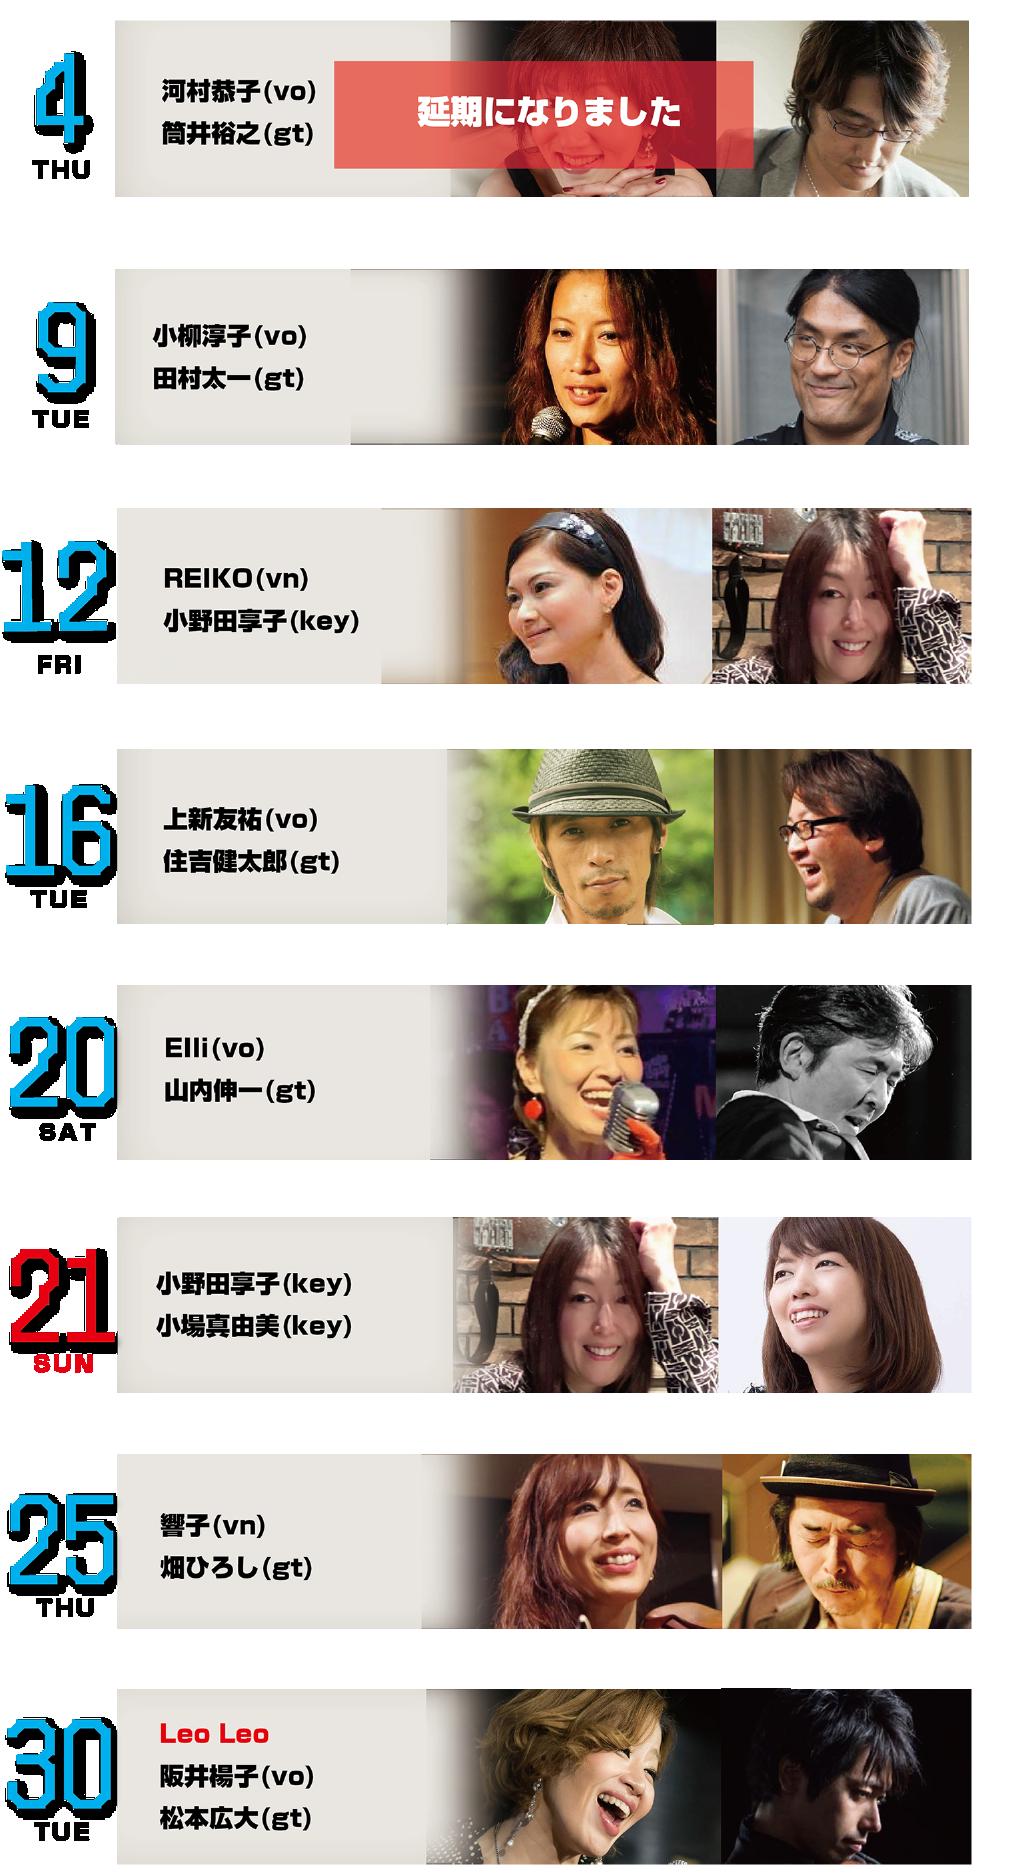 https://kitano-pickup.com/php/images/020.6-web%E7%94%A8.png